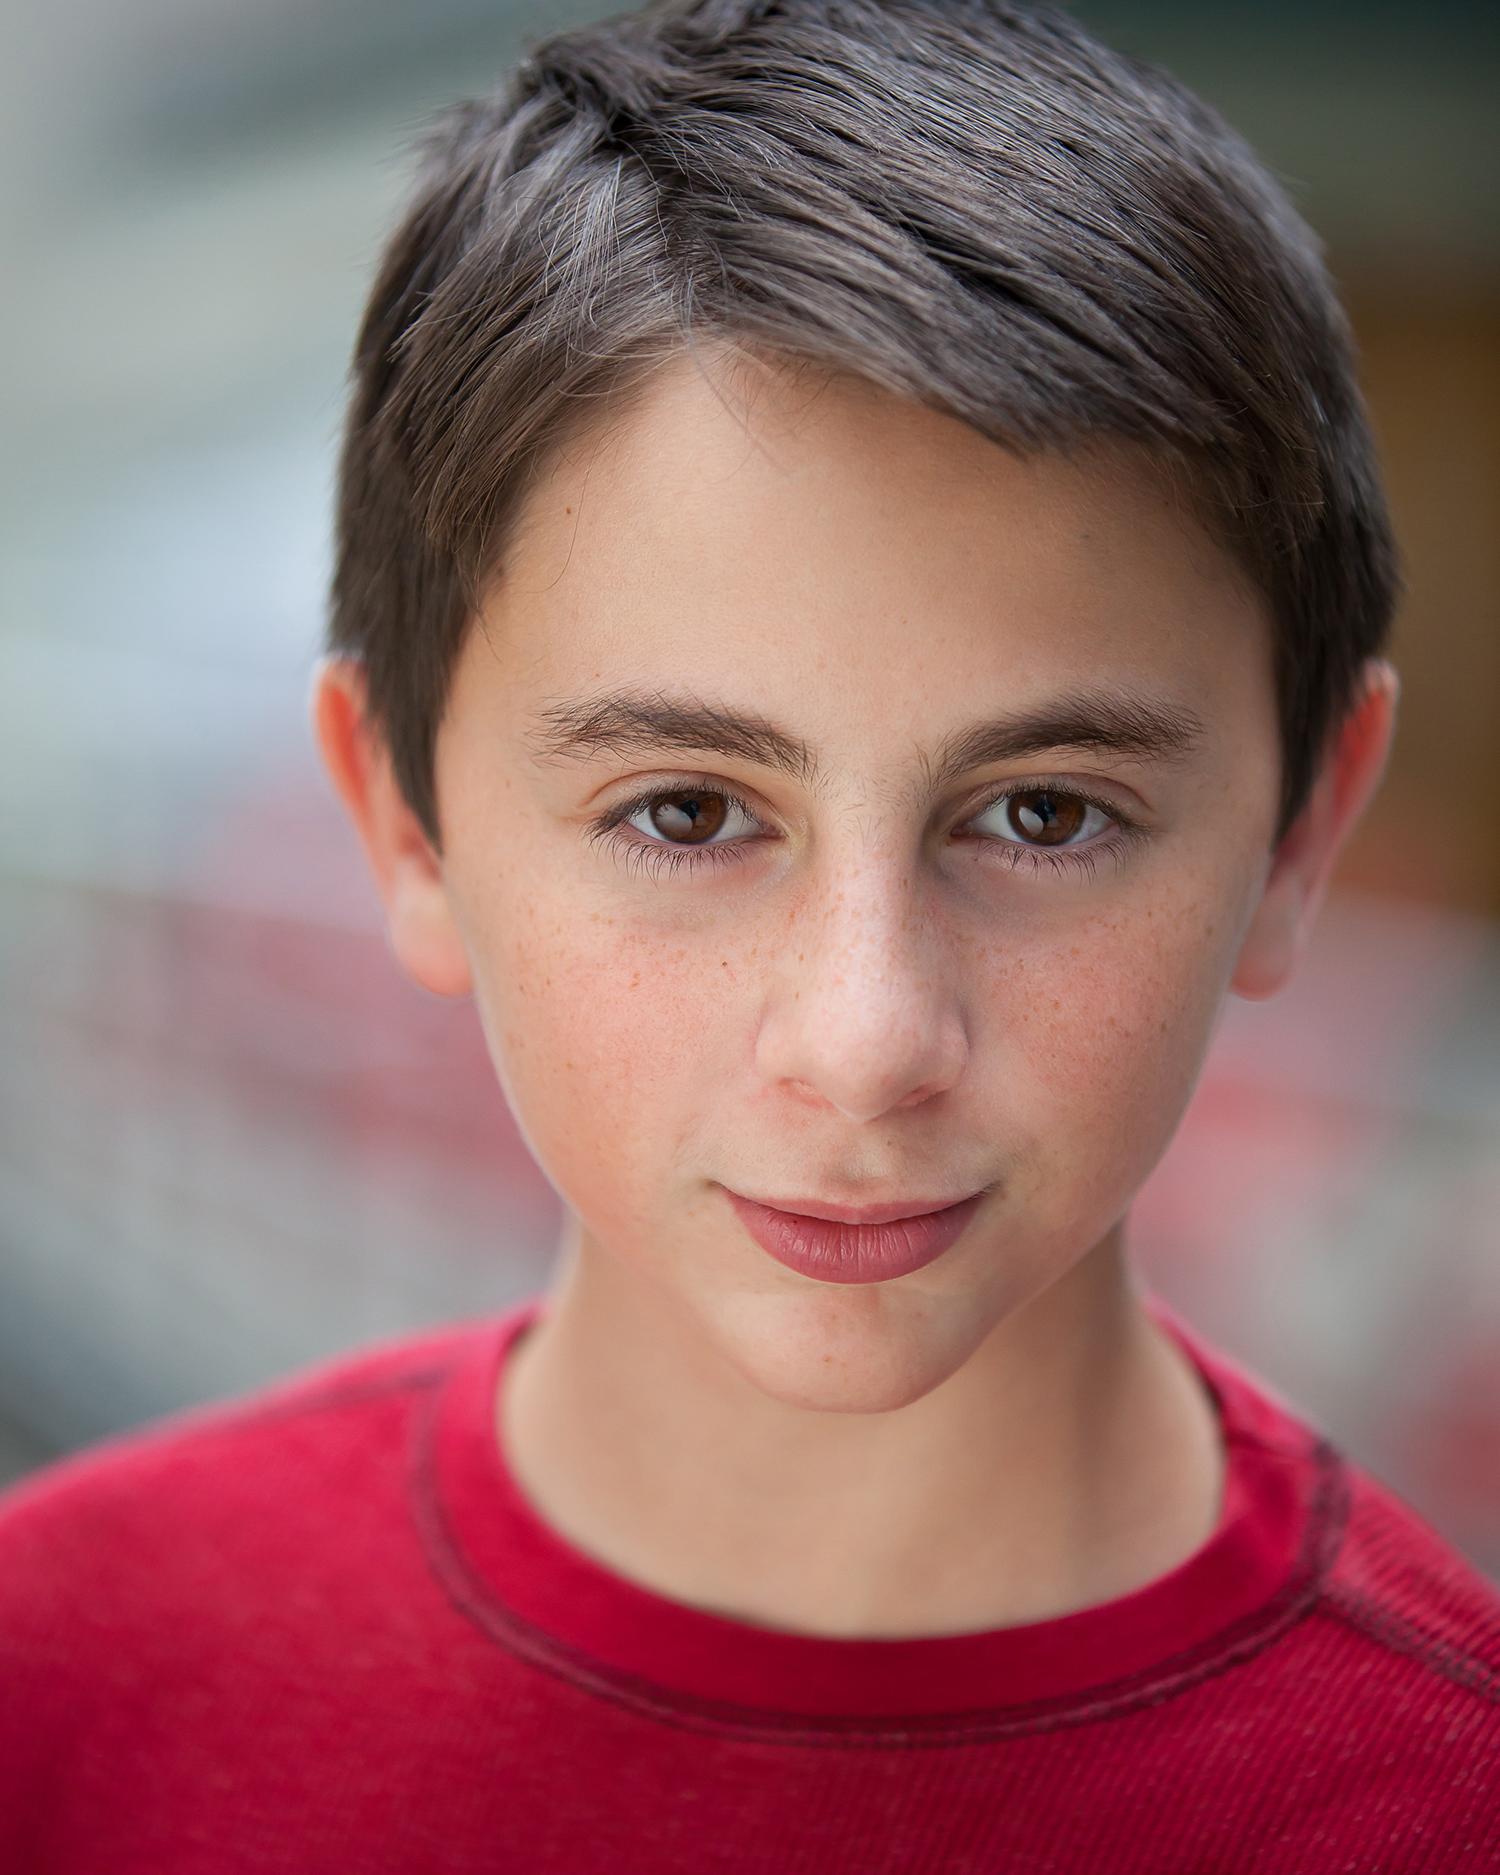 Child boy Actor Headshots with Denver photographer Jennifer Koskinen | Merritt Portrait Studio